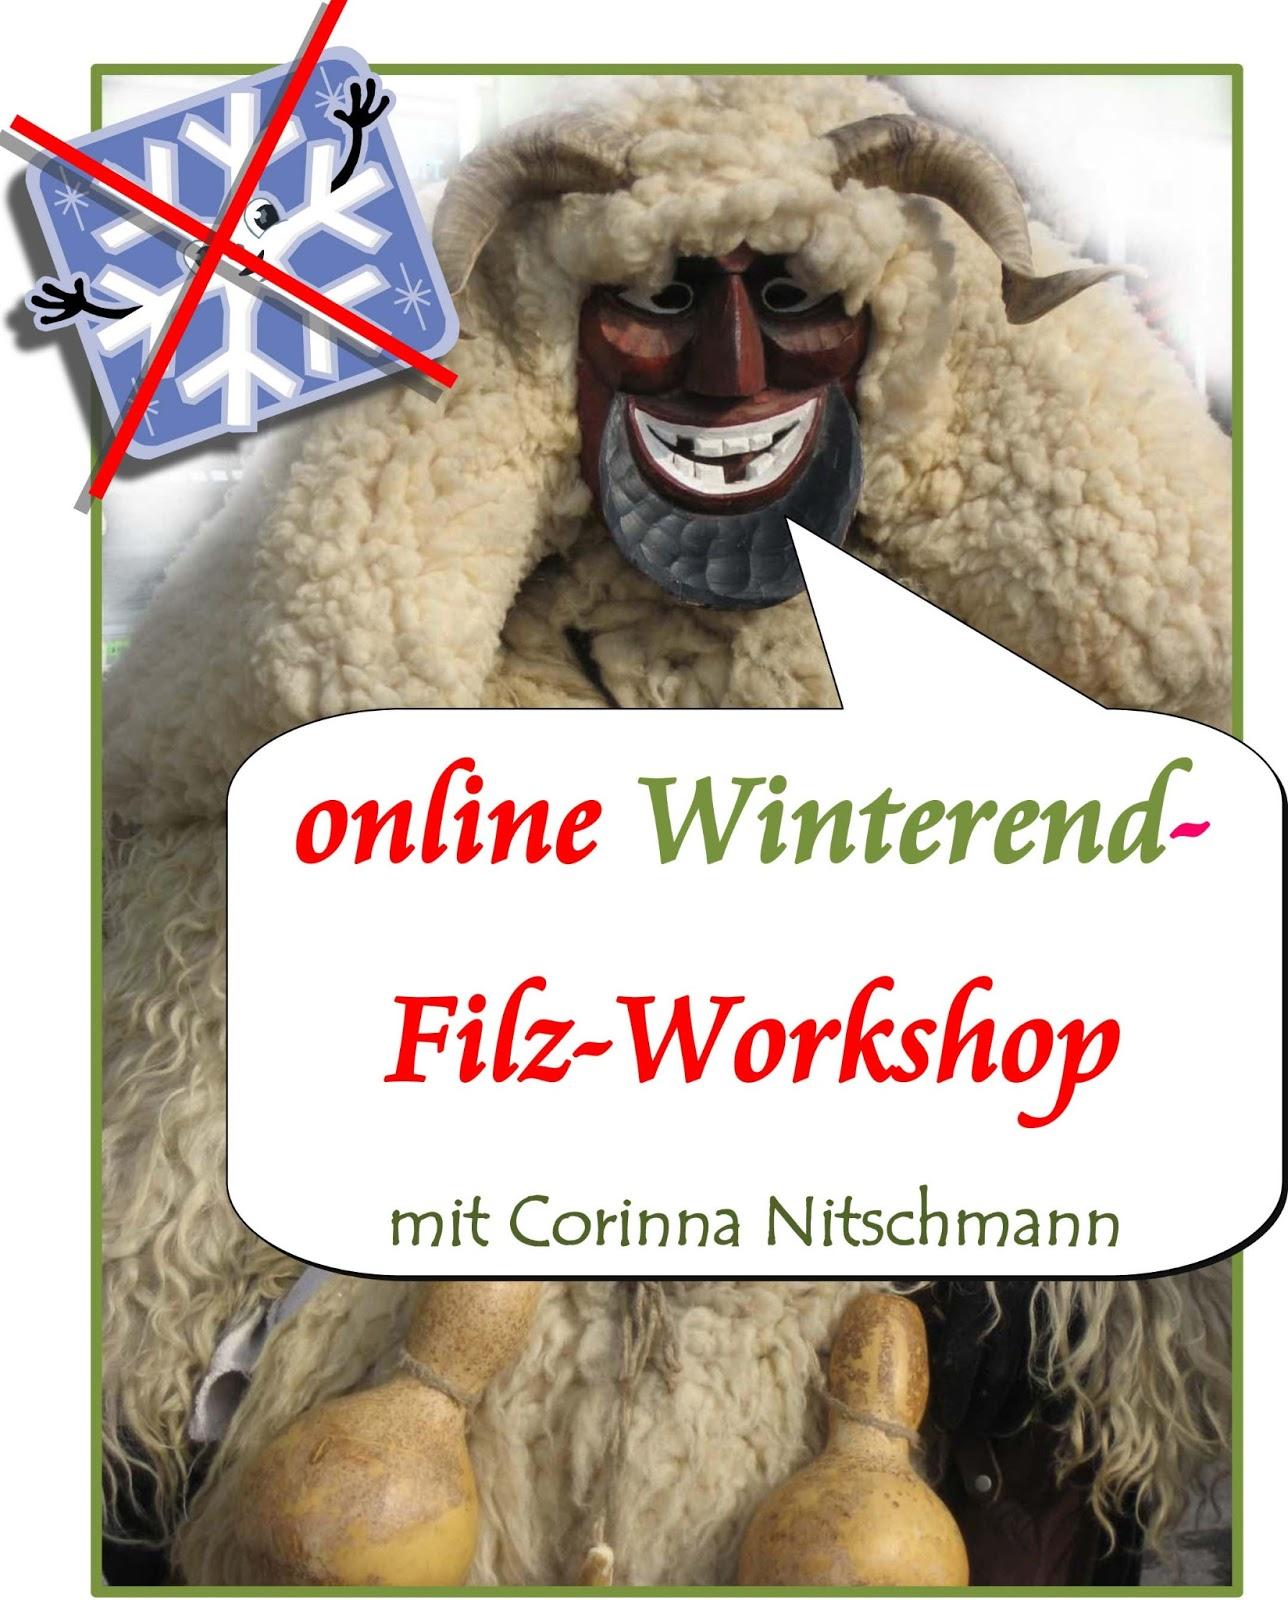 corinna-nitschmann online Filzkurse